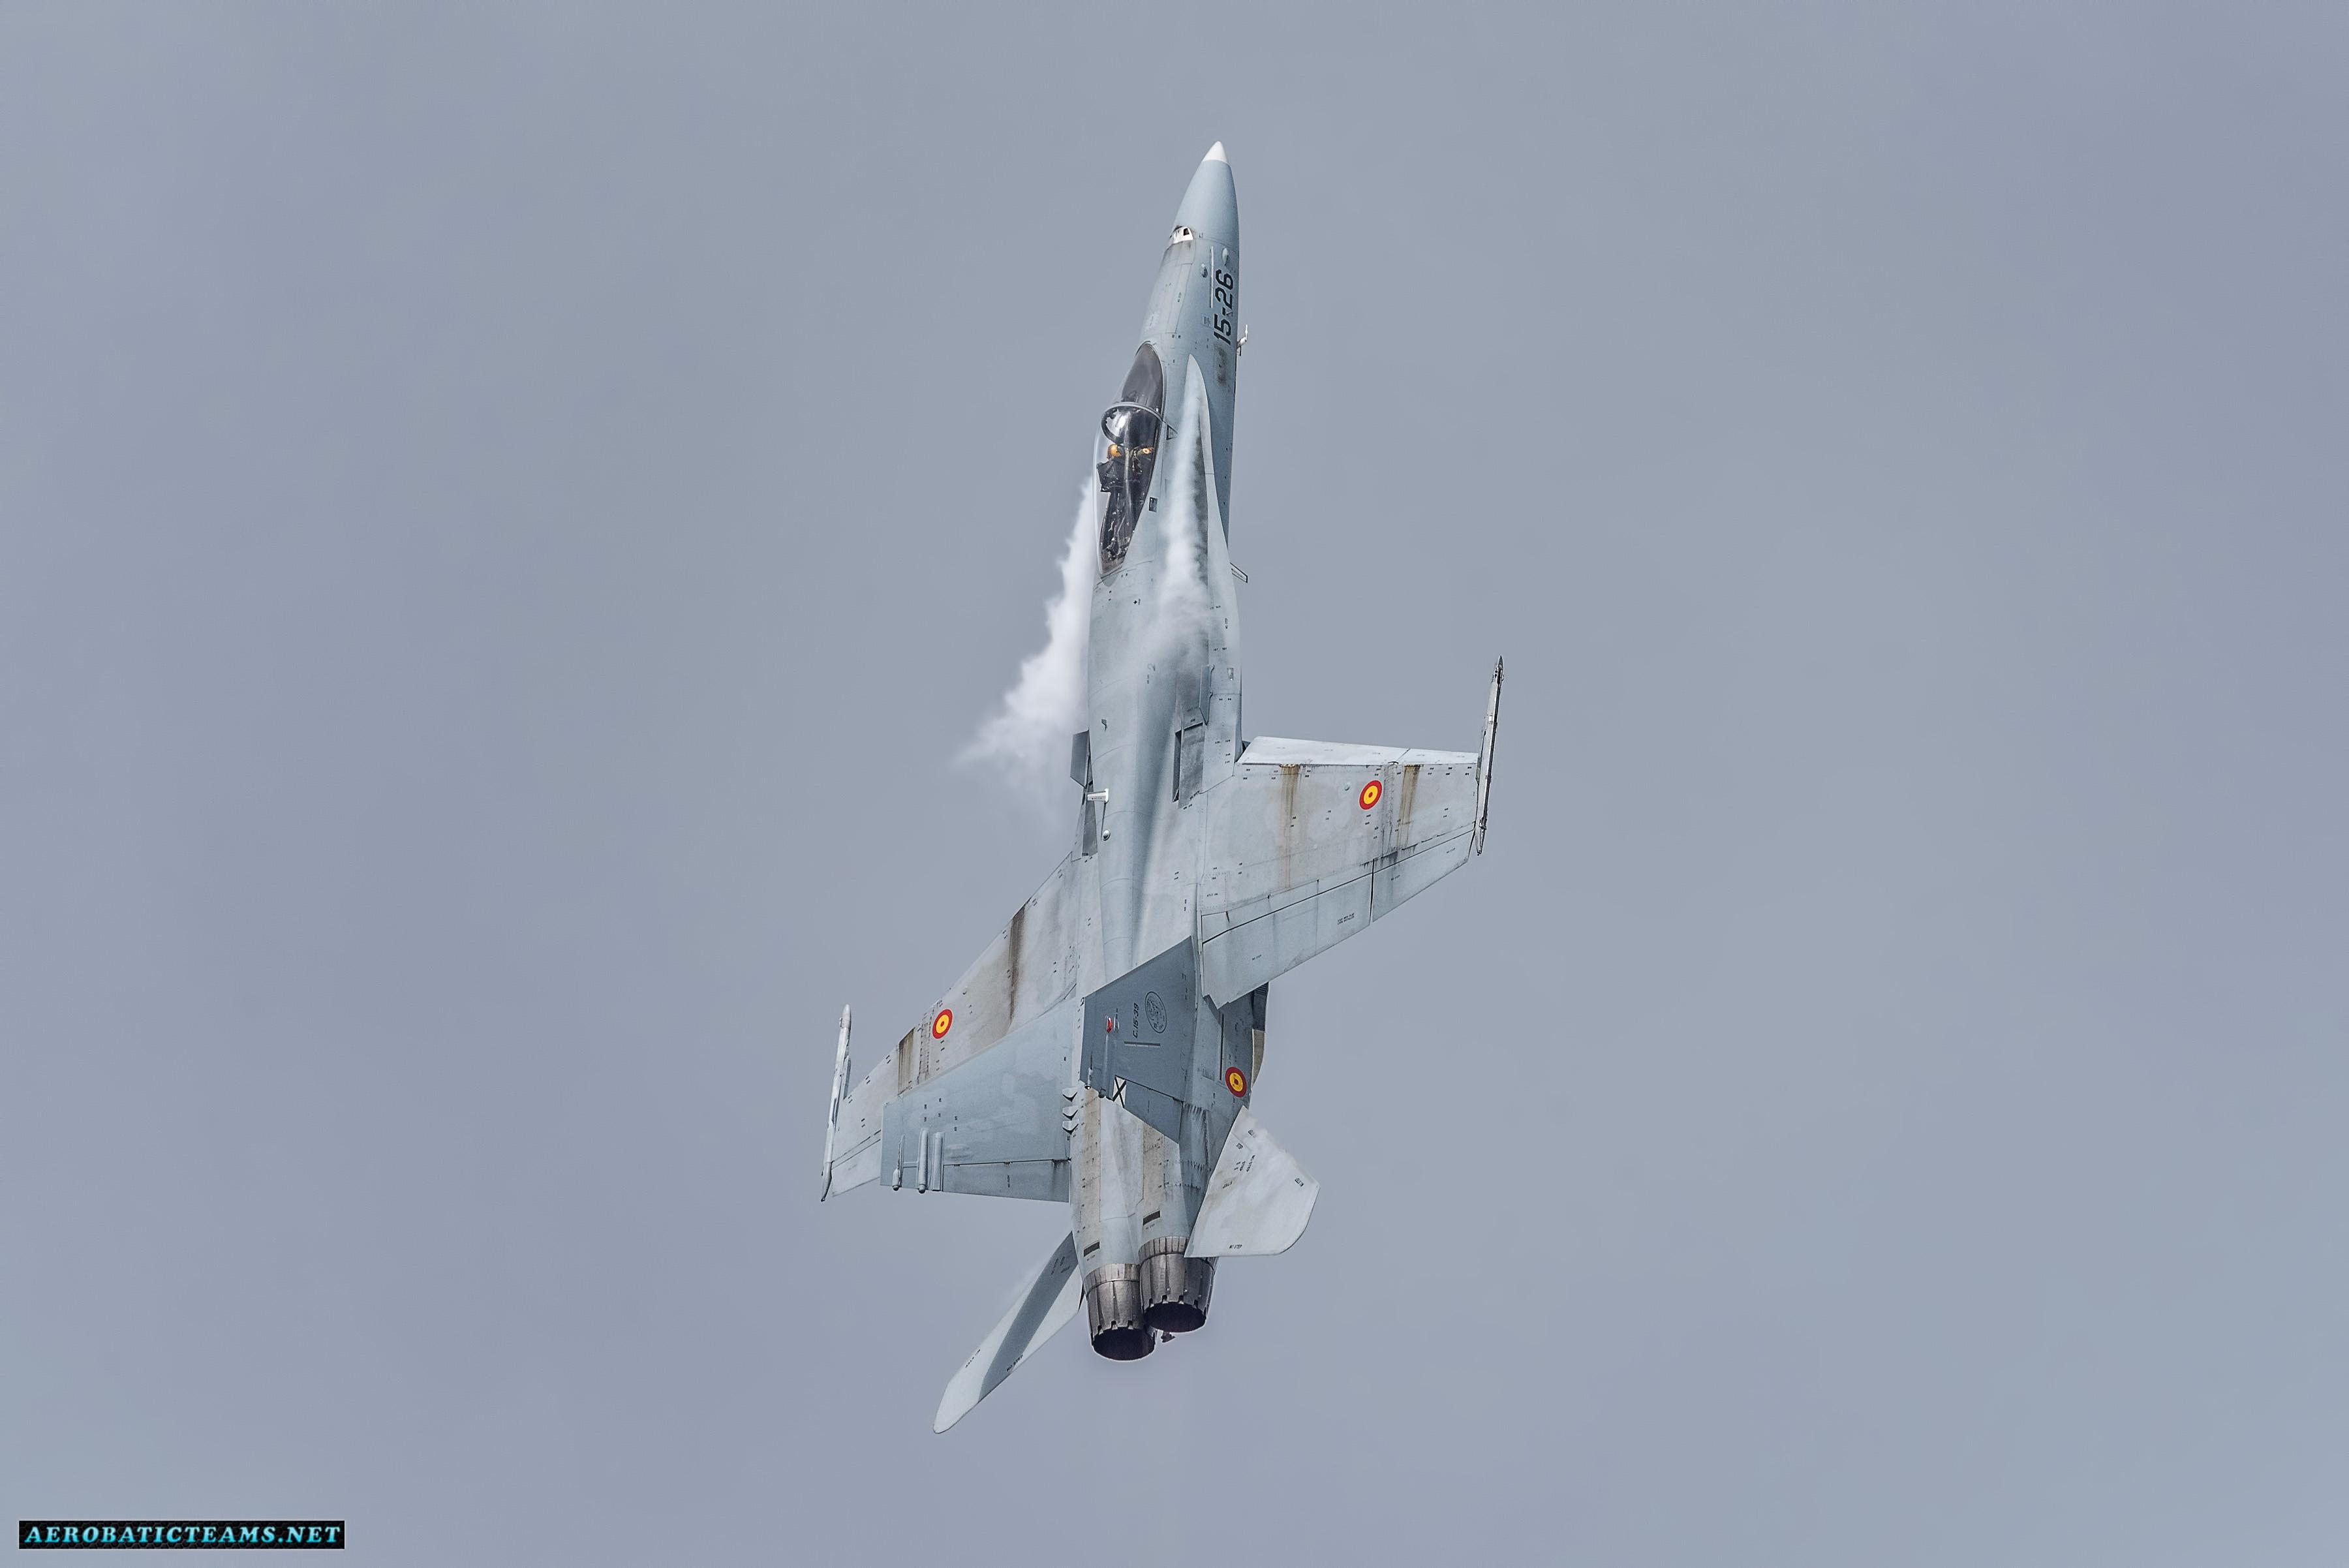 Spanish Air Force F-18 Hornet